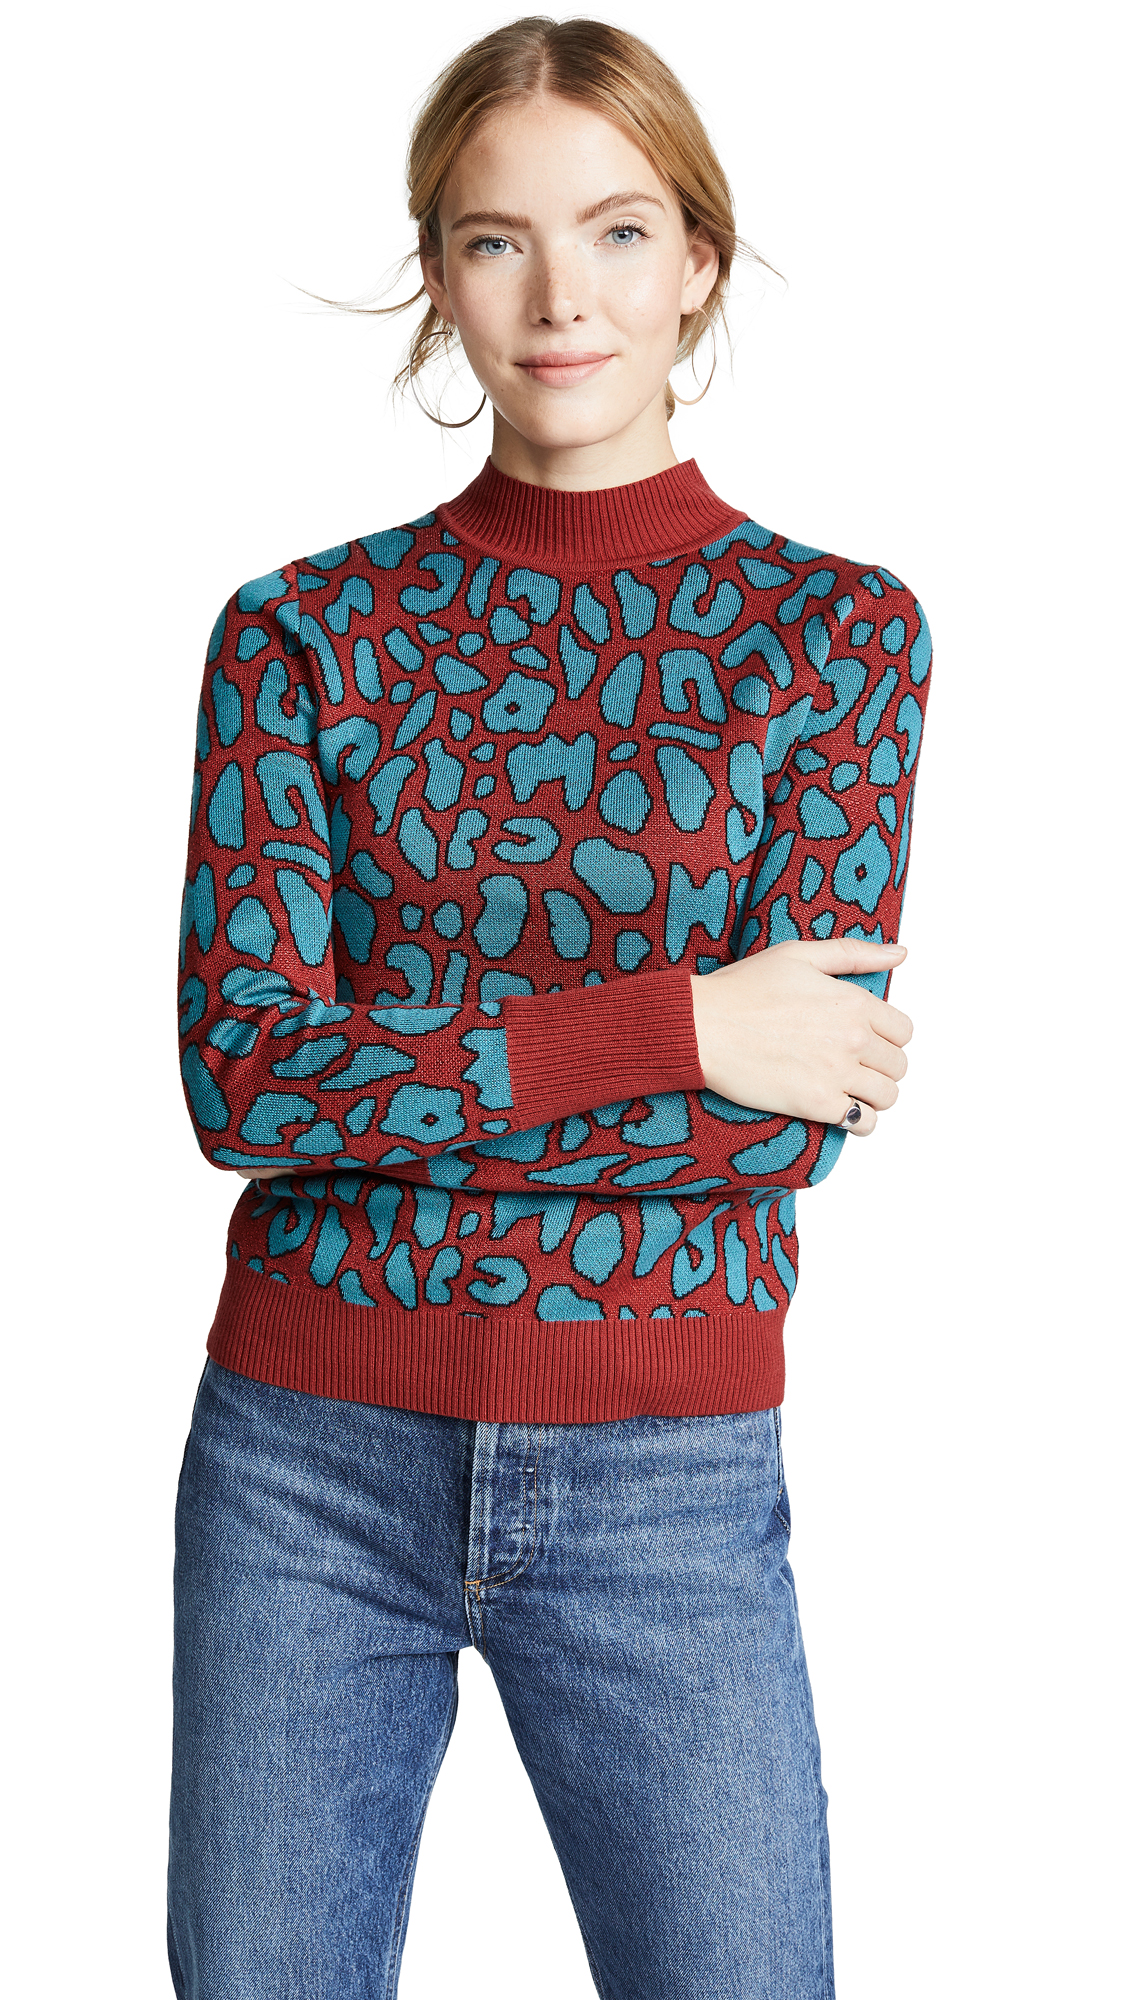 GLAMOROUS Leopard Sweater in Red/Blue Leopard